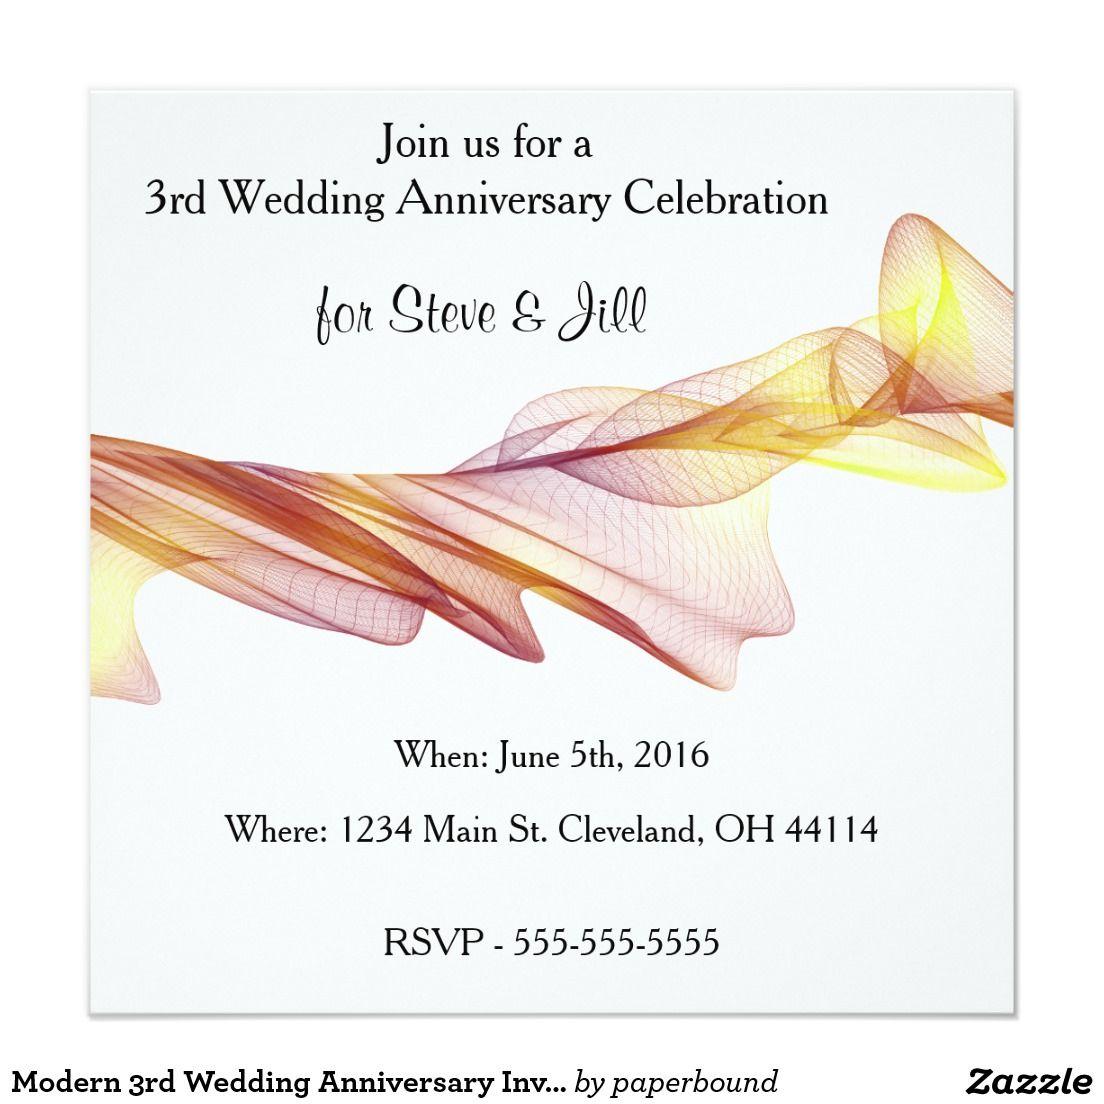 Modern 3rd Wedding Anniversary Invitation Zazzle Com Anniversary Invitations 3rd Wedding Anniversary Wedding Anniversary Invitations